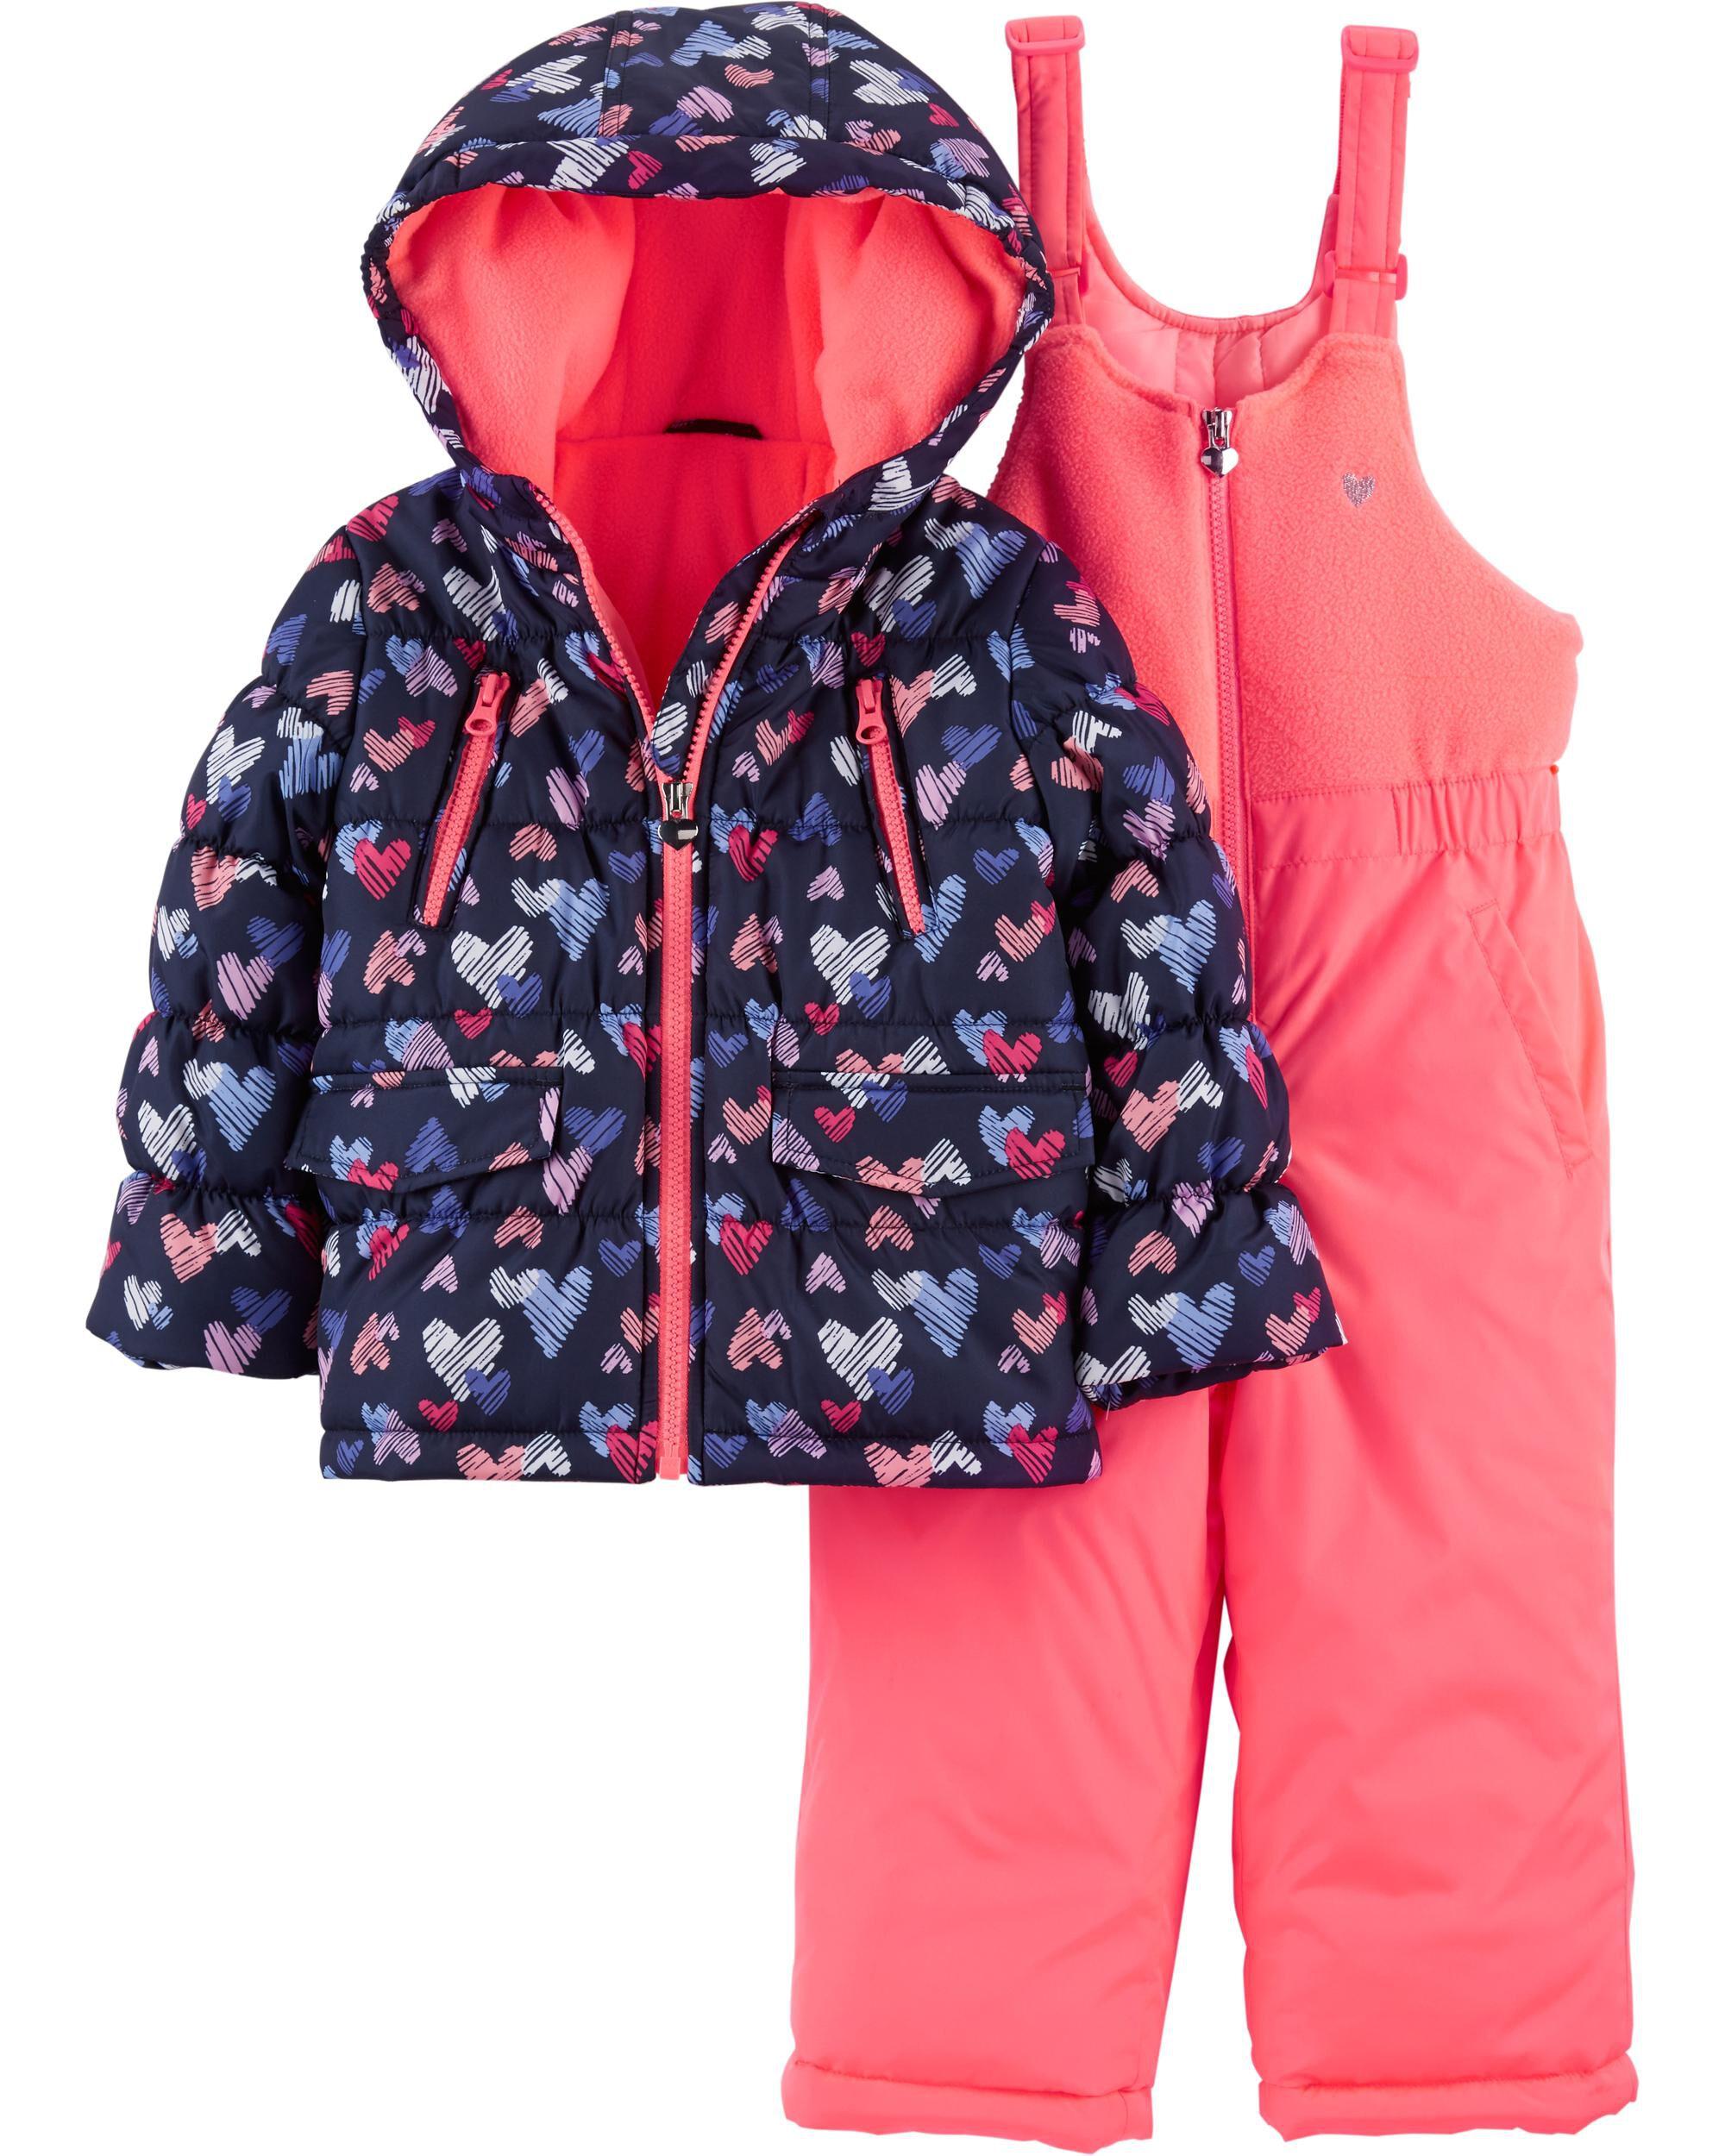 187fed6f0 Toddler Girl 2-Piece Heart Snowsuit Set   OshKosh.com